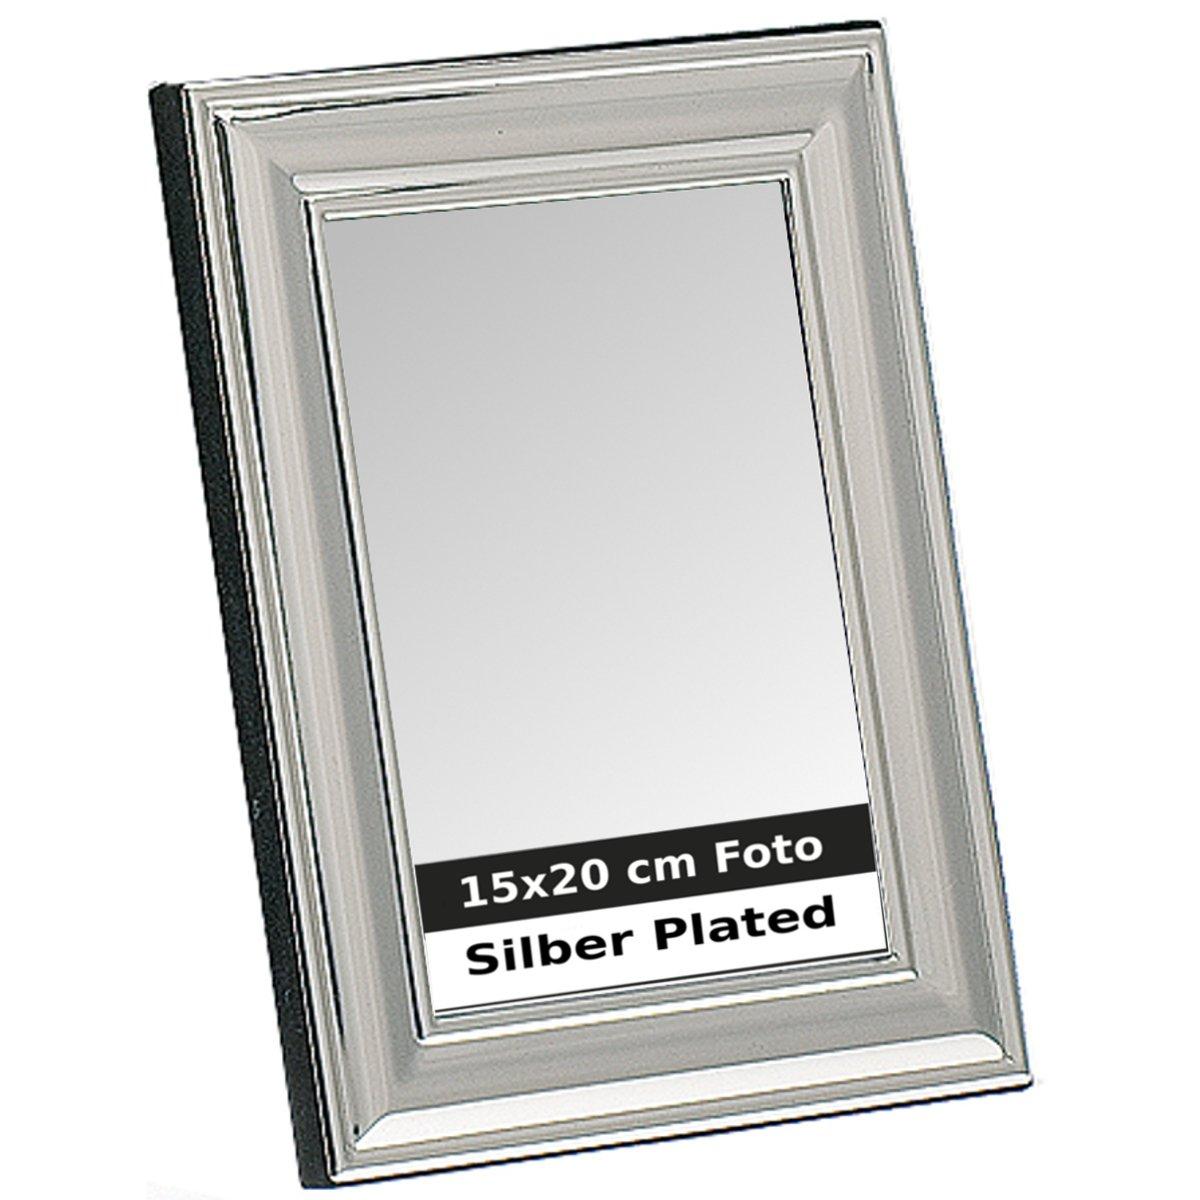 Tolle Graviert Bilderrahmen Silber Galerie - Rahmen Ideen ...